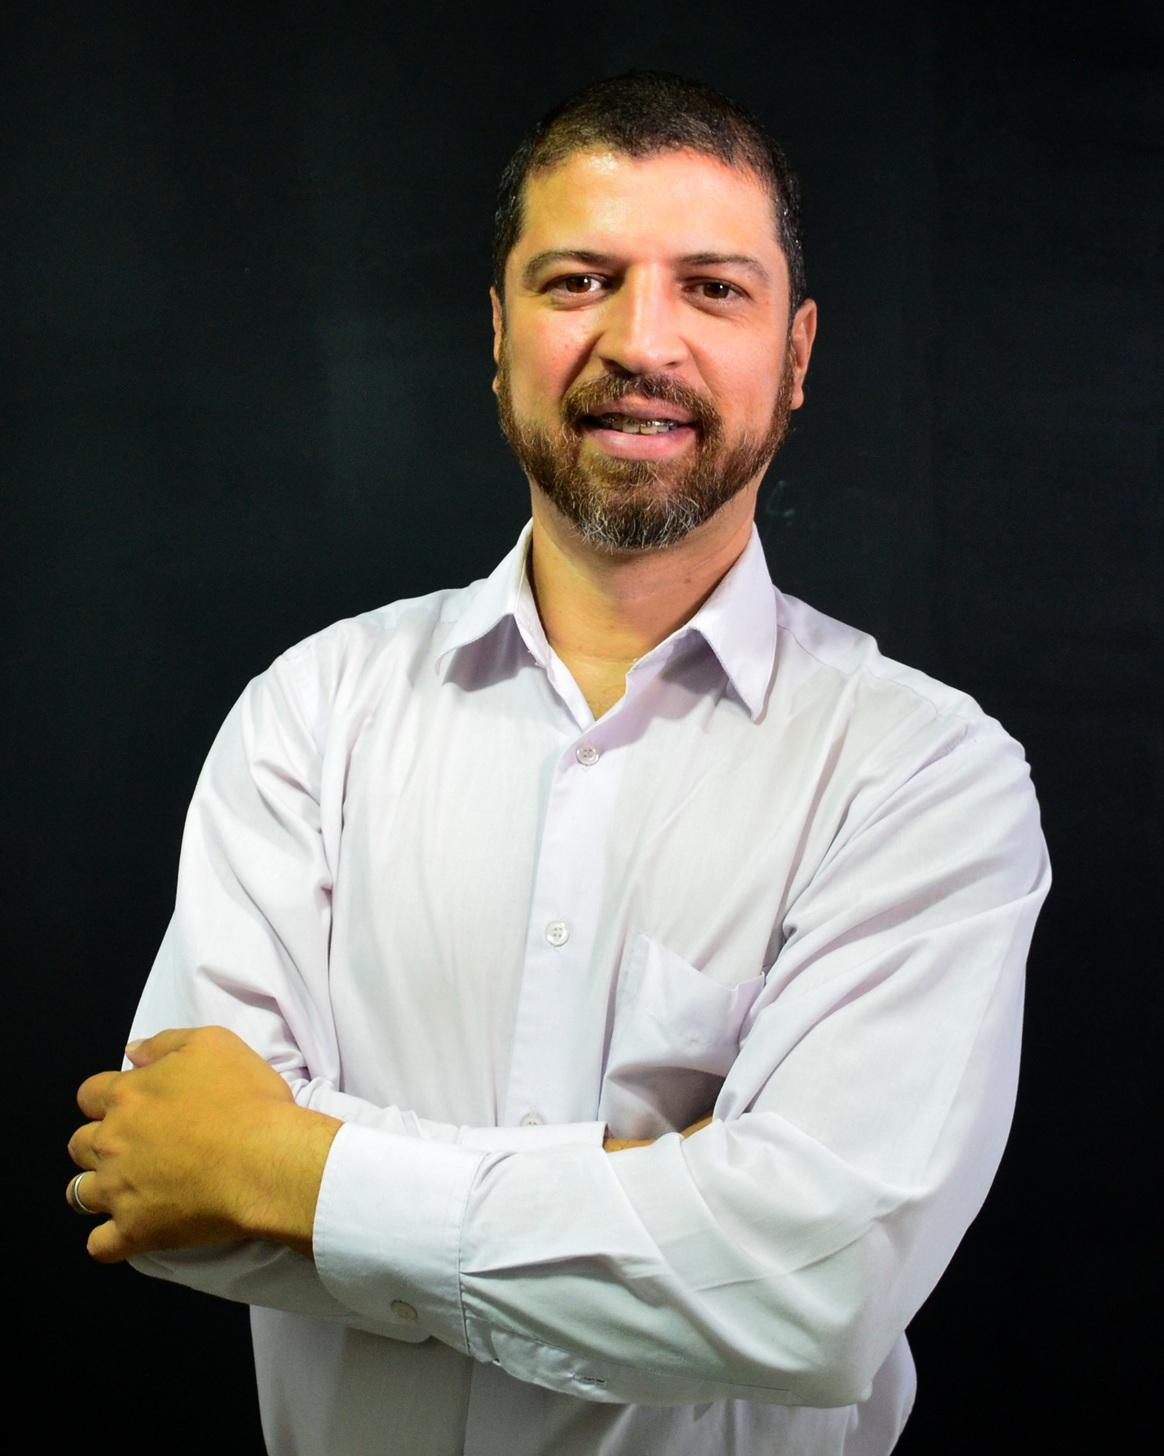 Trainer Maxwell Braga